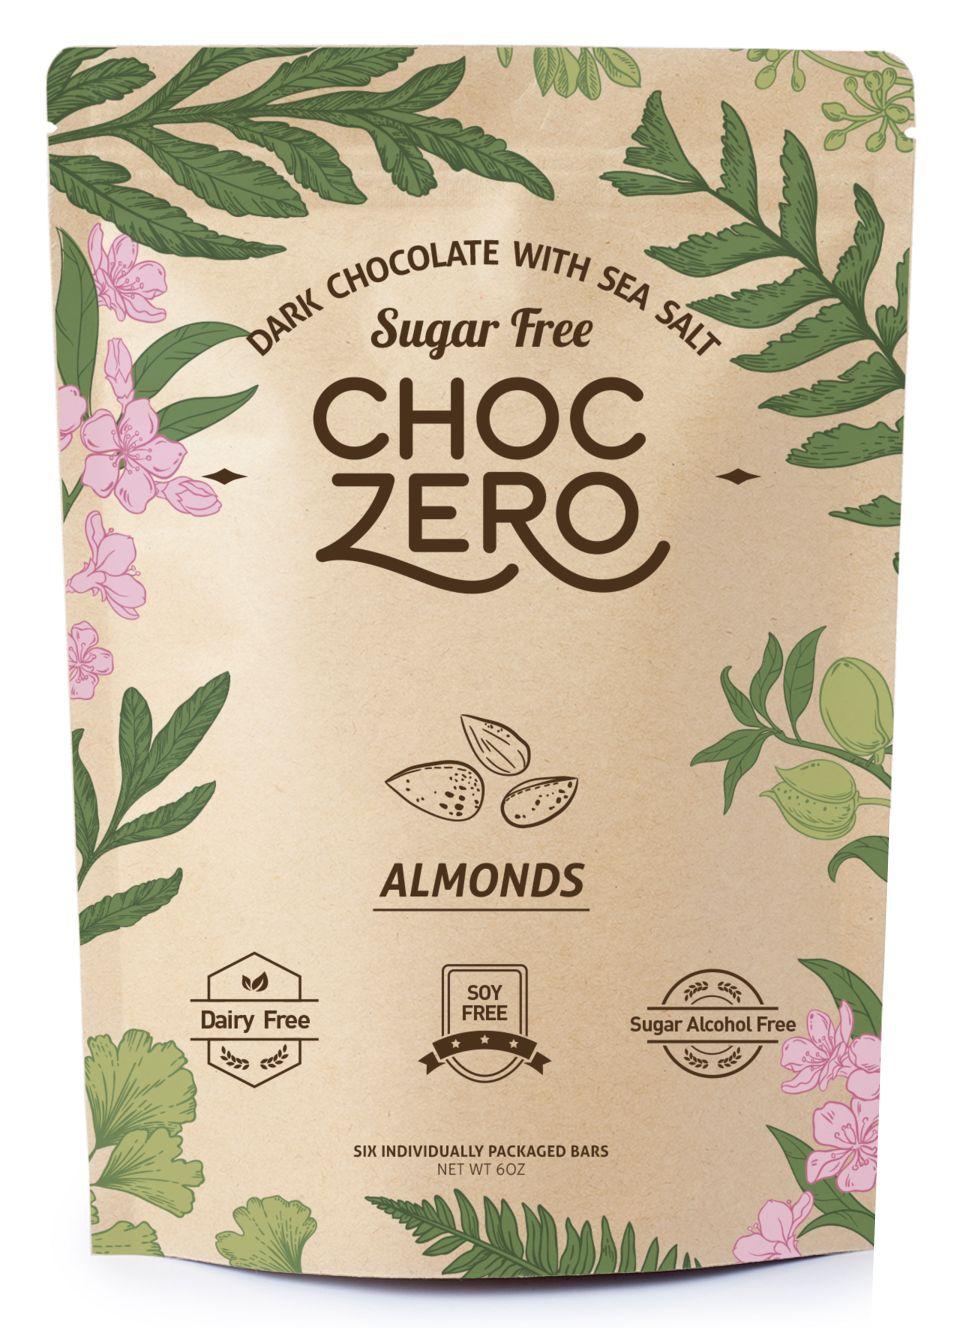 Choc Zero's Dark Chocolate Products Are The Perfect Treat Any Season